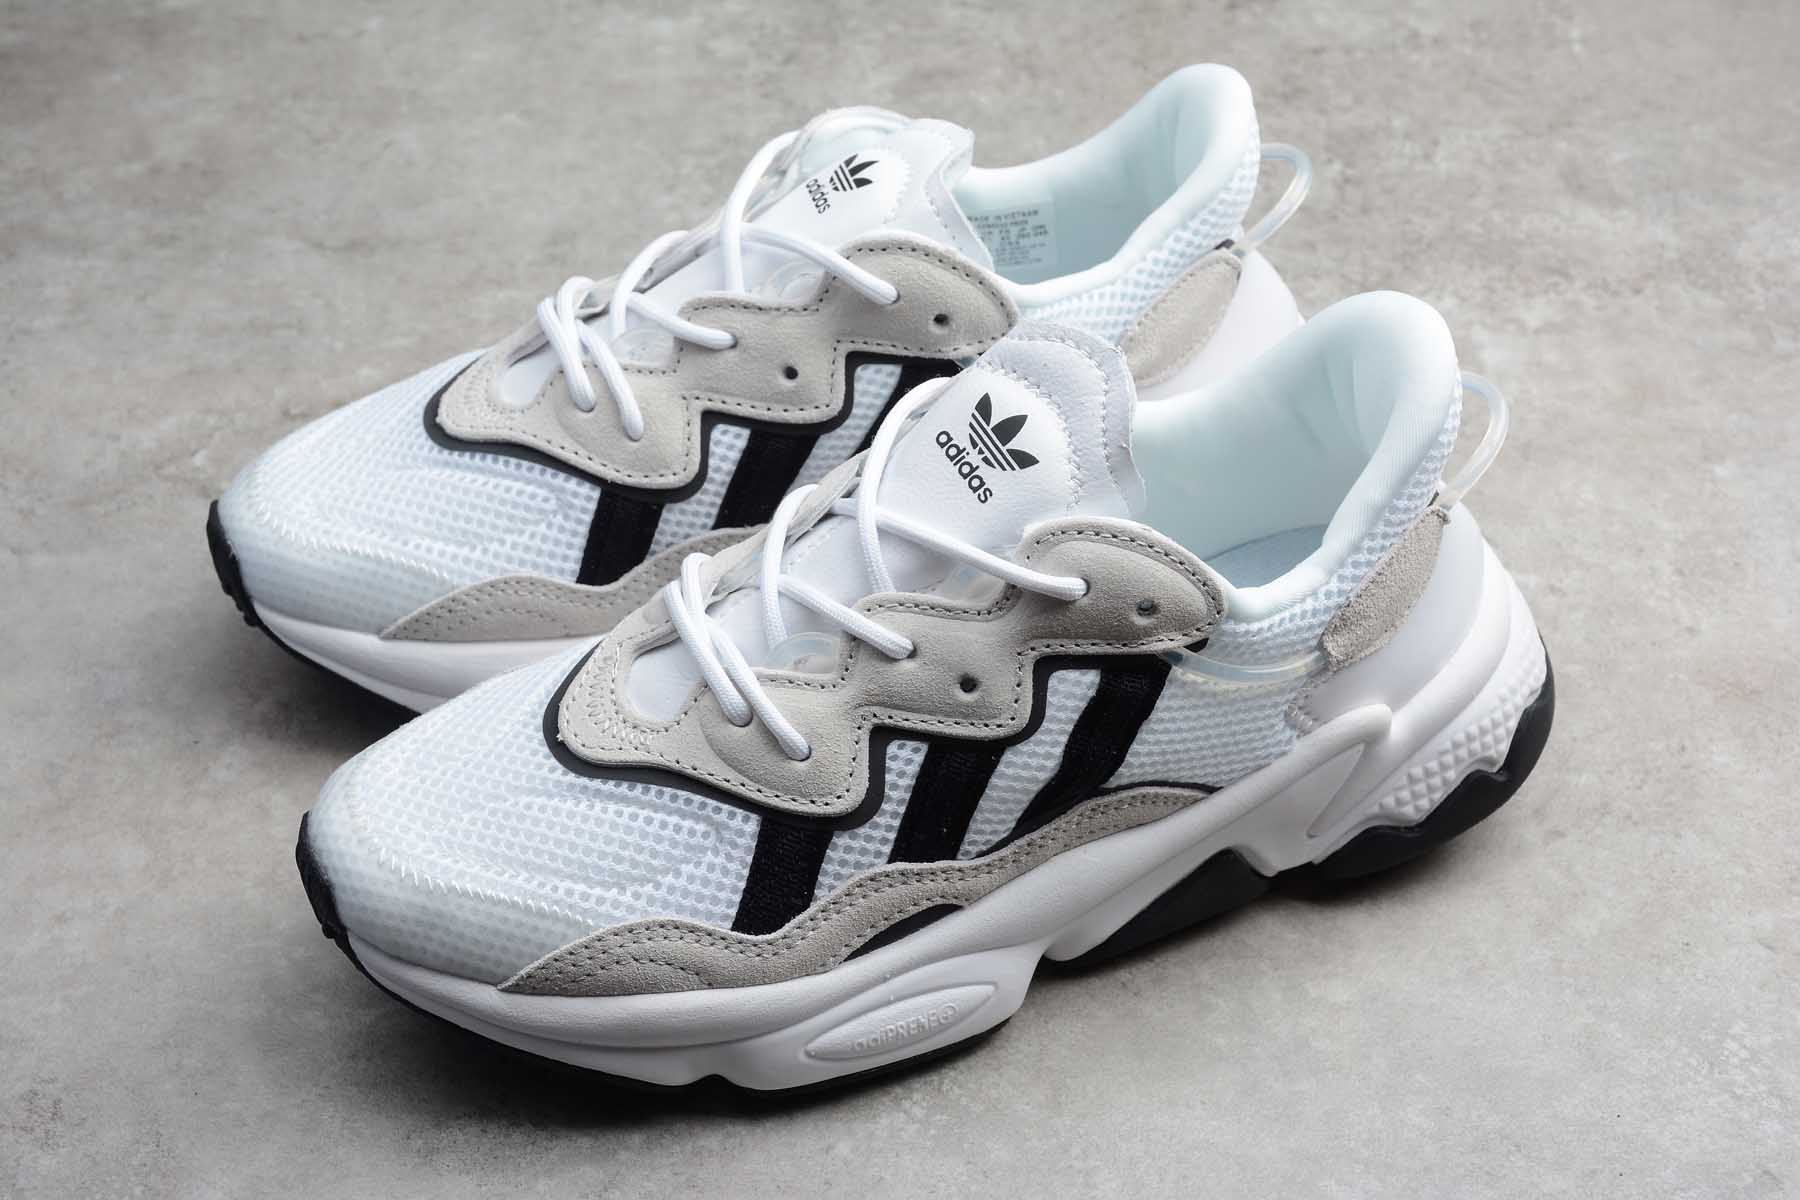 Adidas Originals Ozweego Pride Hvid Sort Sand Sko